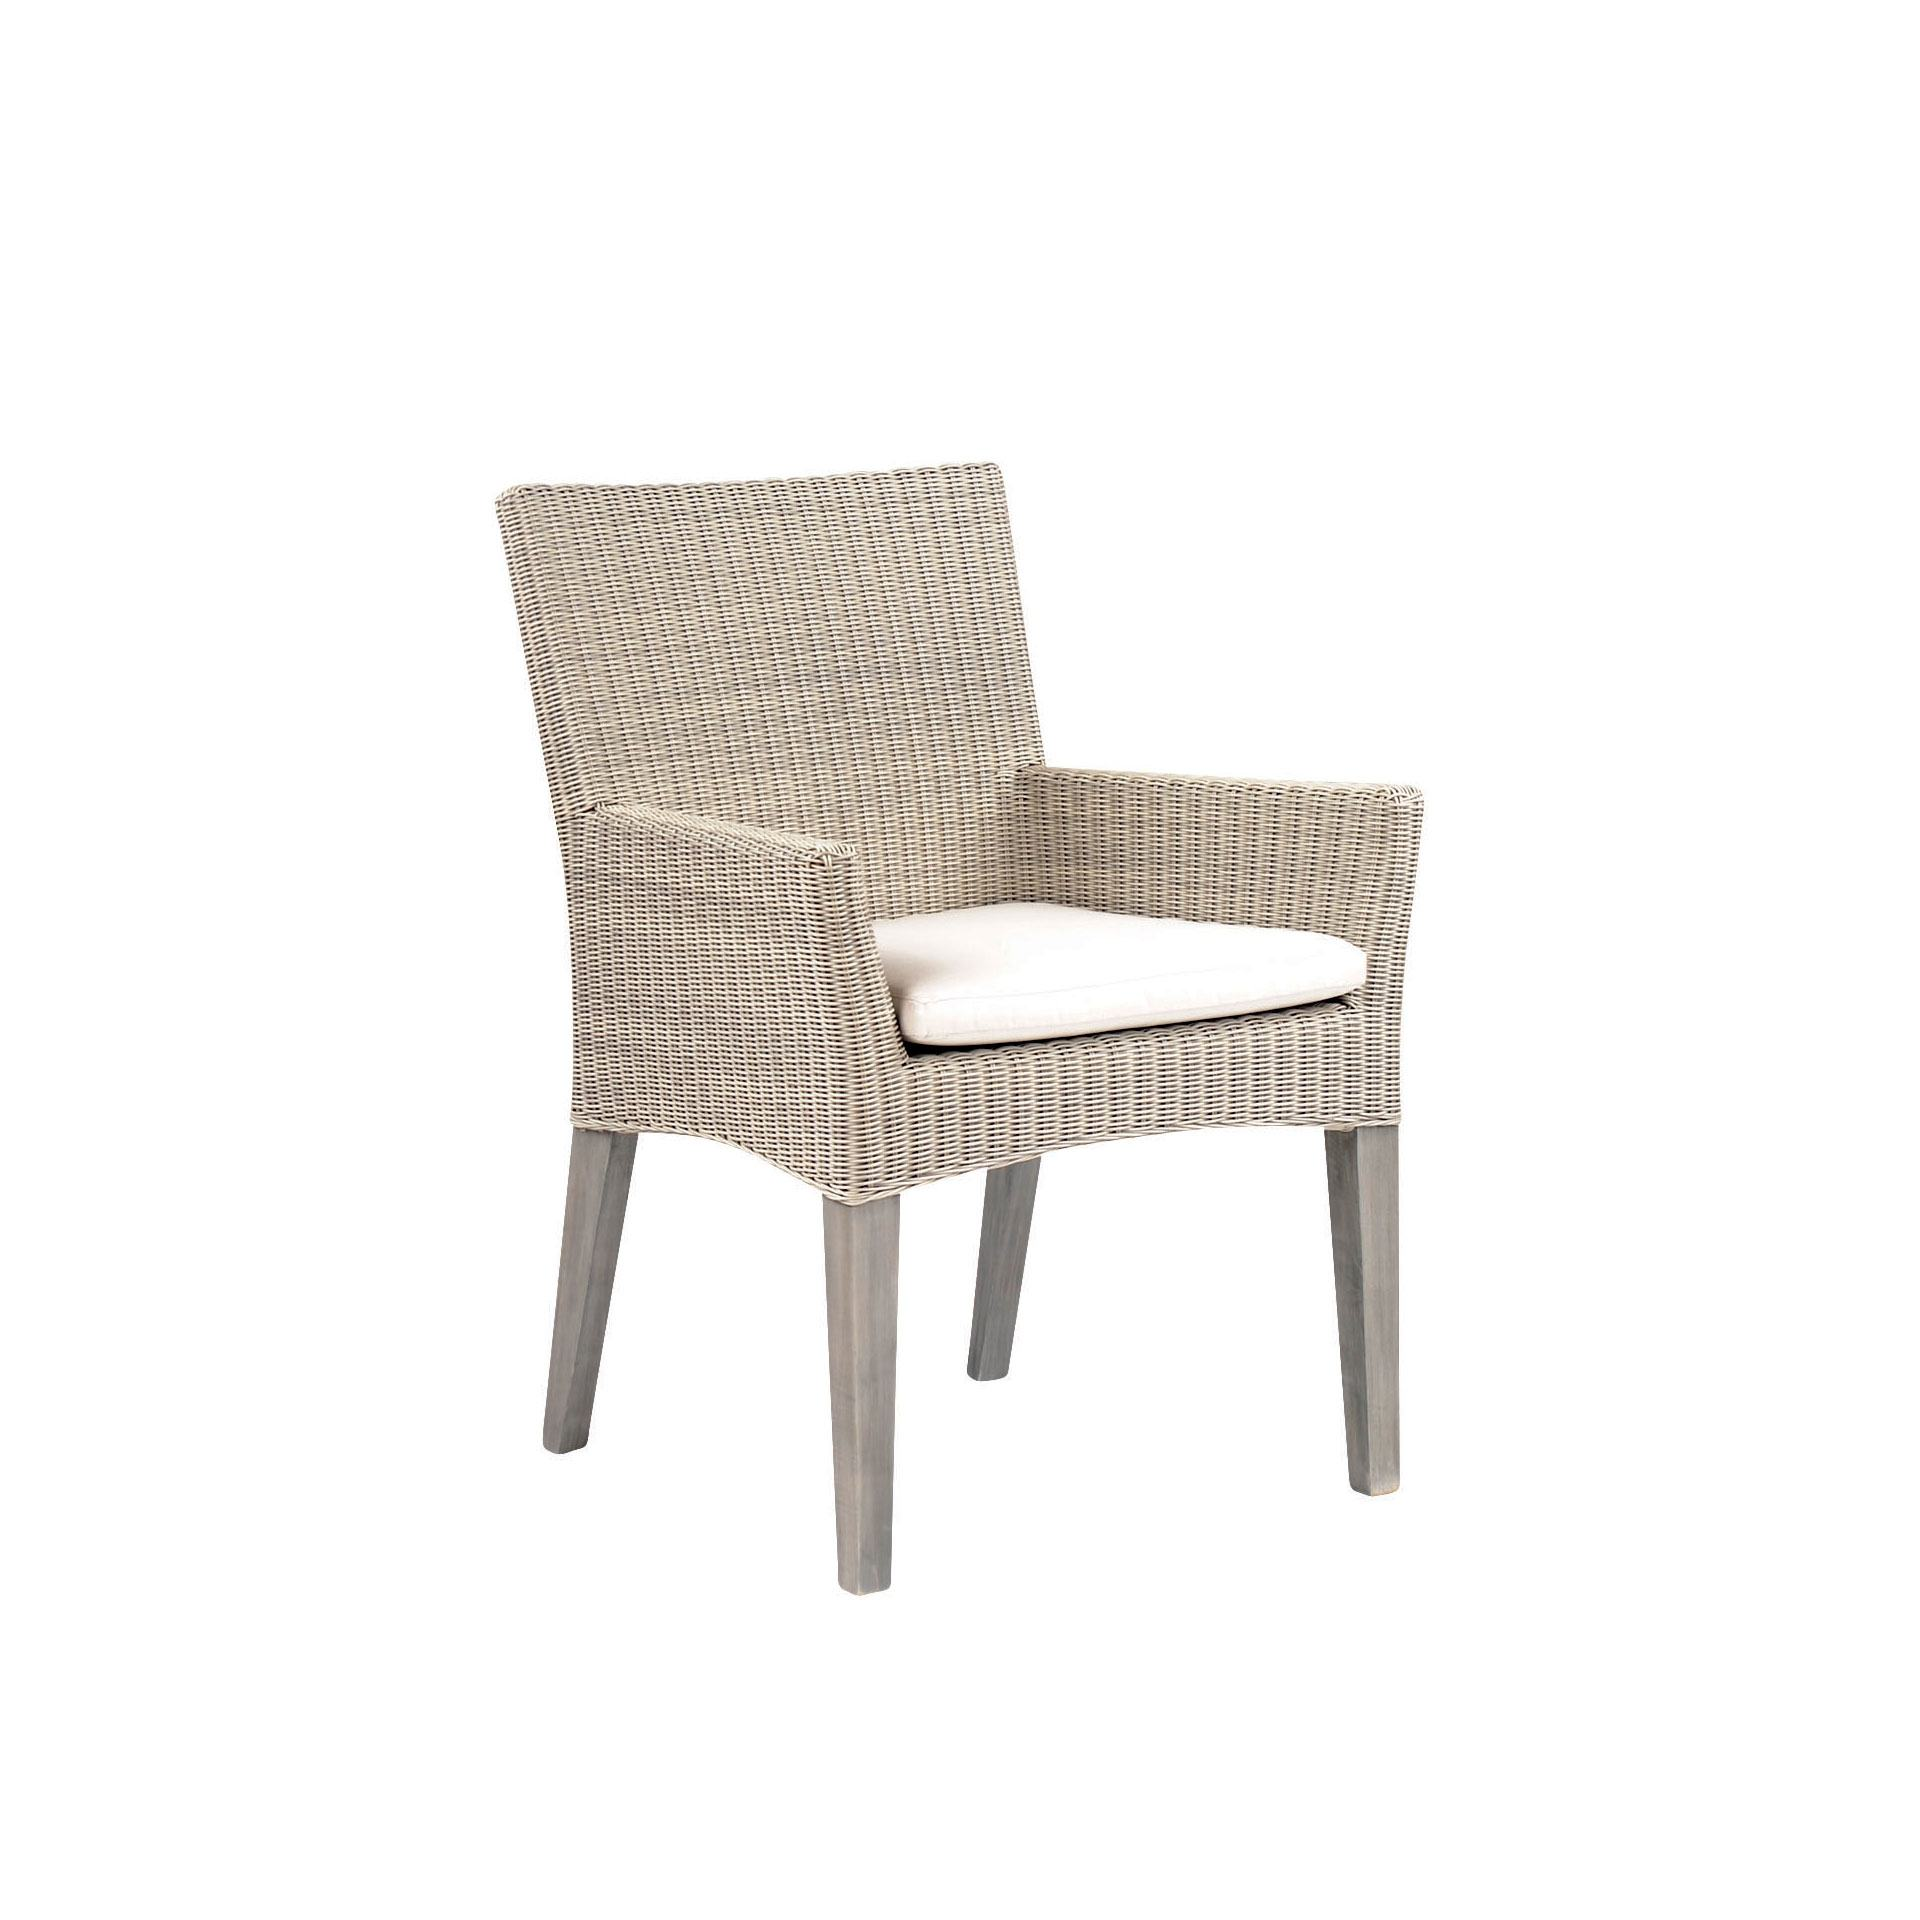 Kingsley Bate Paris Dining Arm Chair Leisure Living